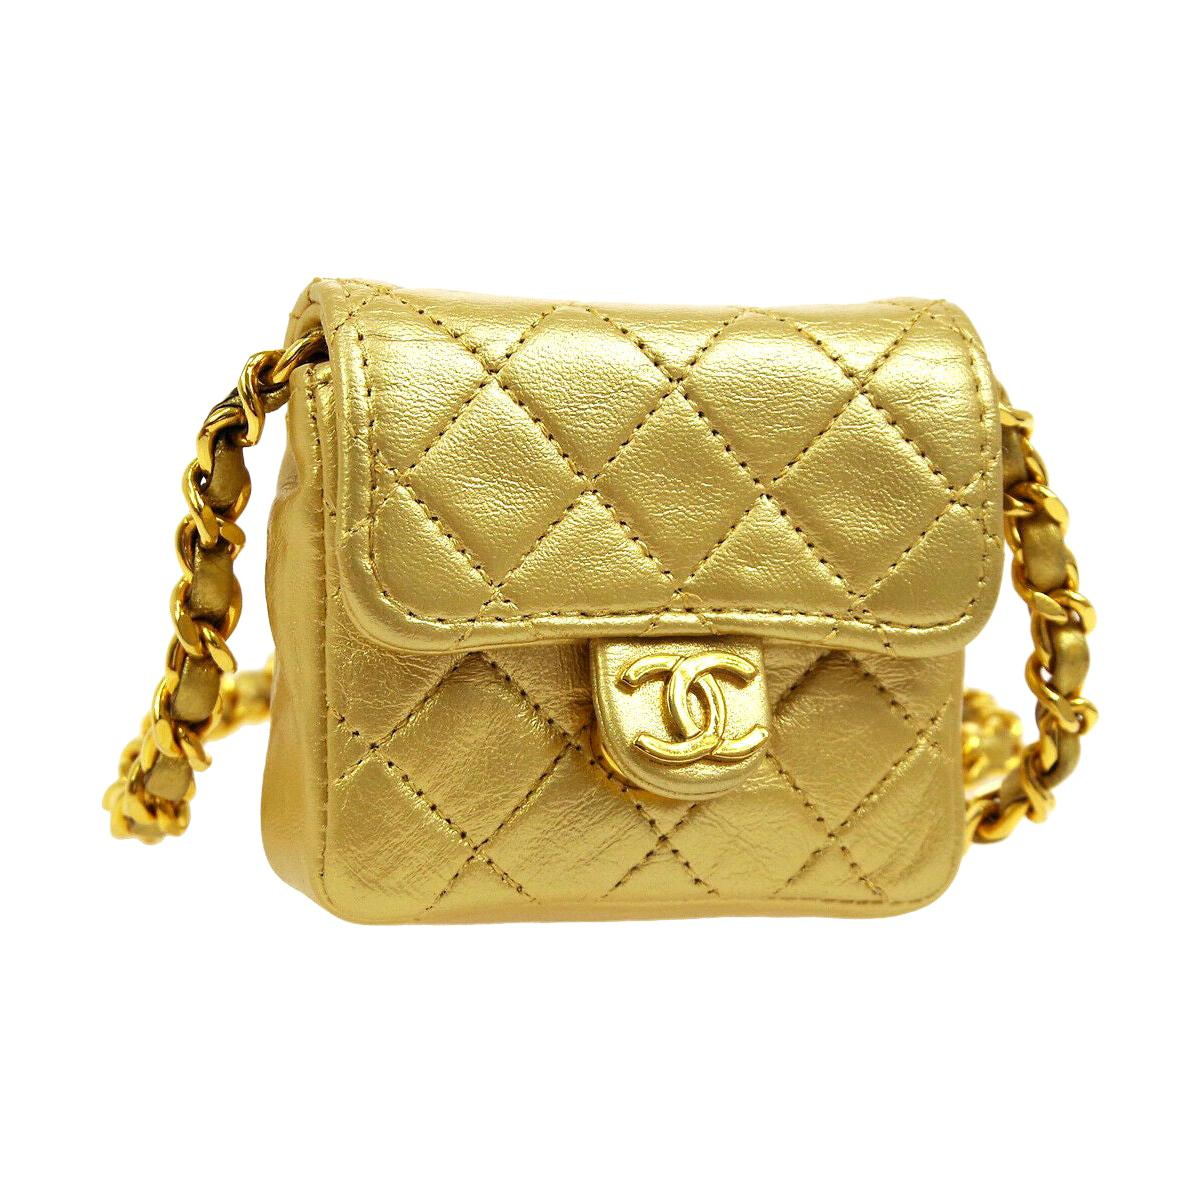 Chanel Metallic Gold Leather Evening Micro Mini Shoulder Flap Bag